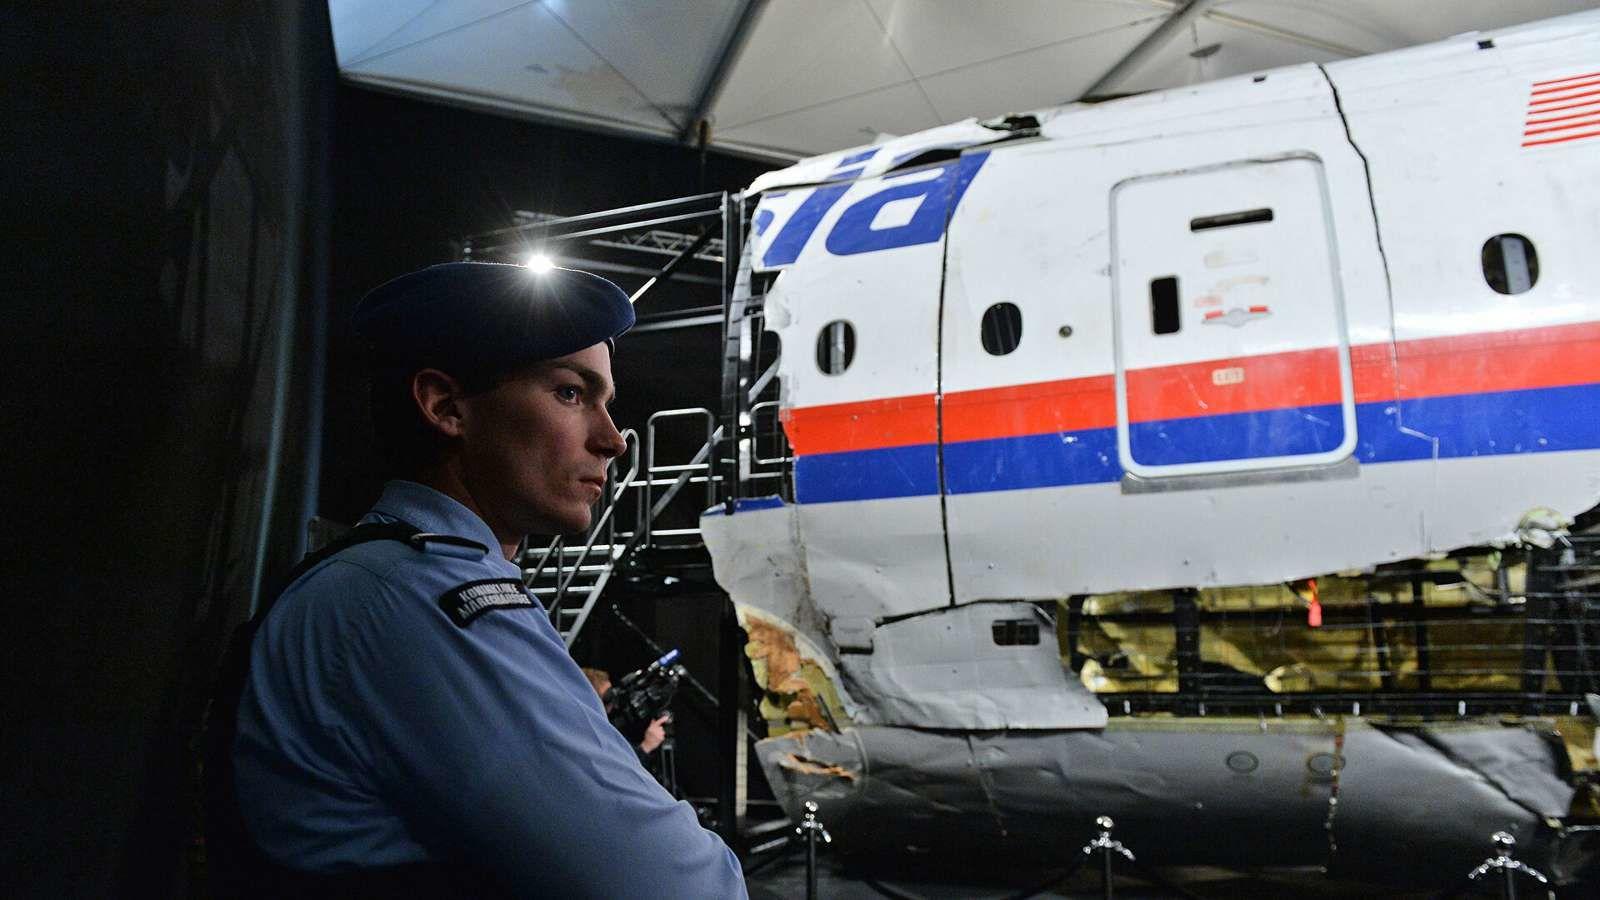 В Гааге начался суд по делу о сбитом Boeing МН17, однако явились не все фигуранты